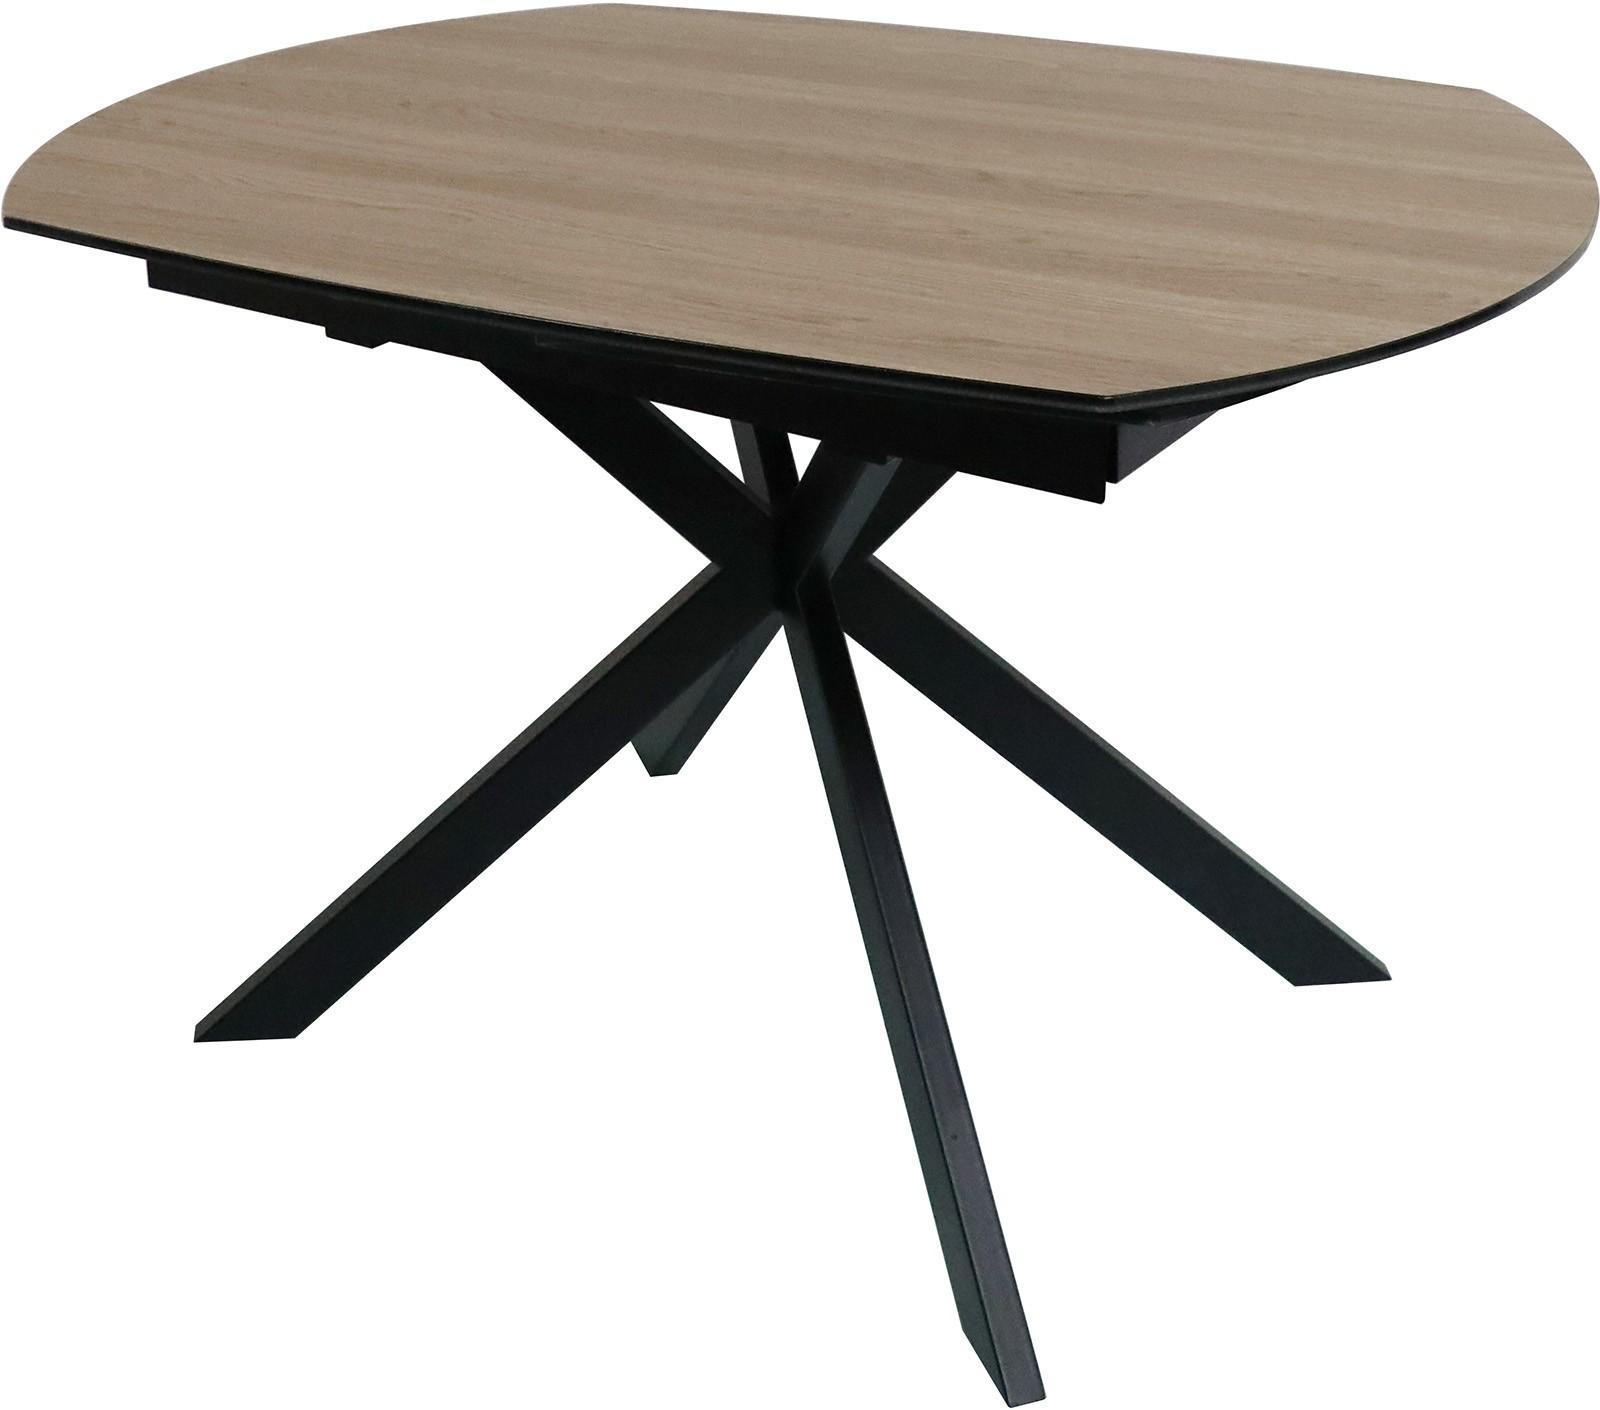 TORONTO LIGHT Motion Dining Table